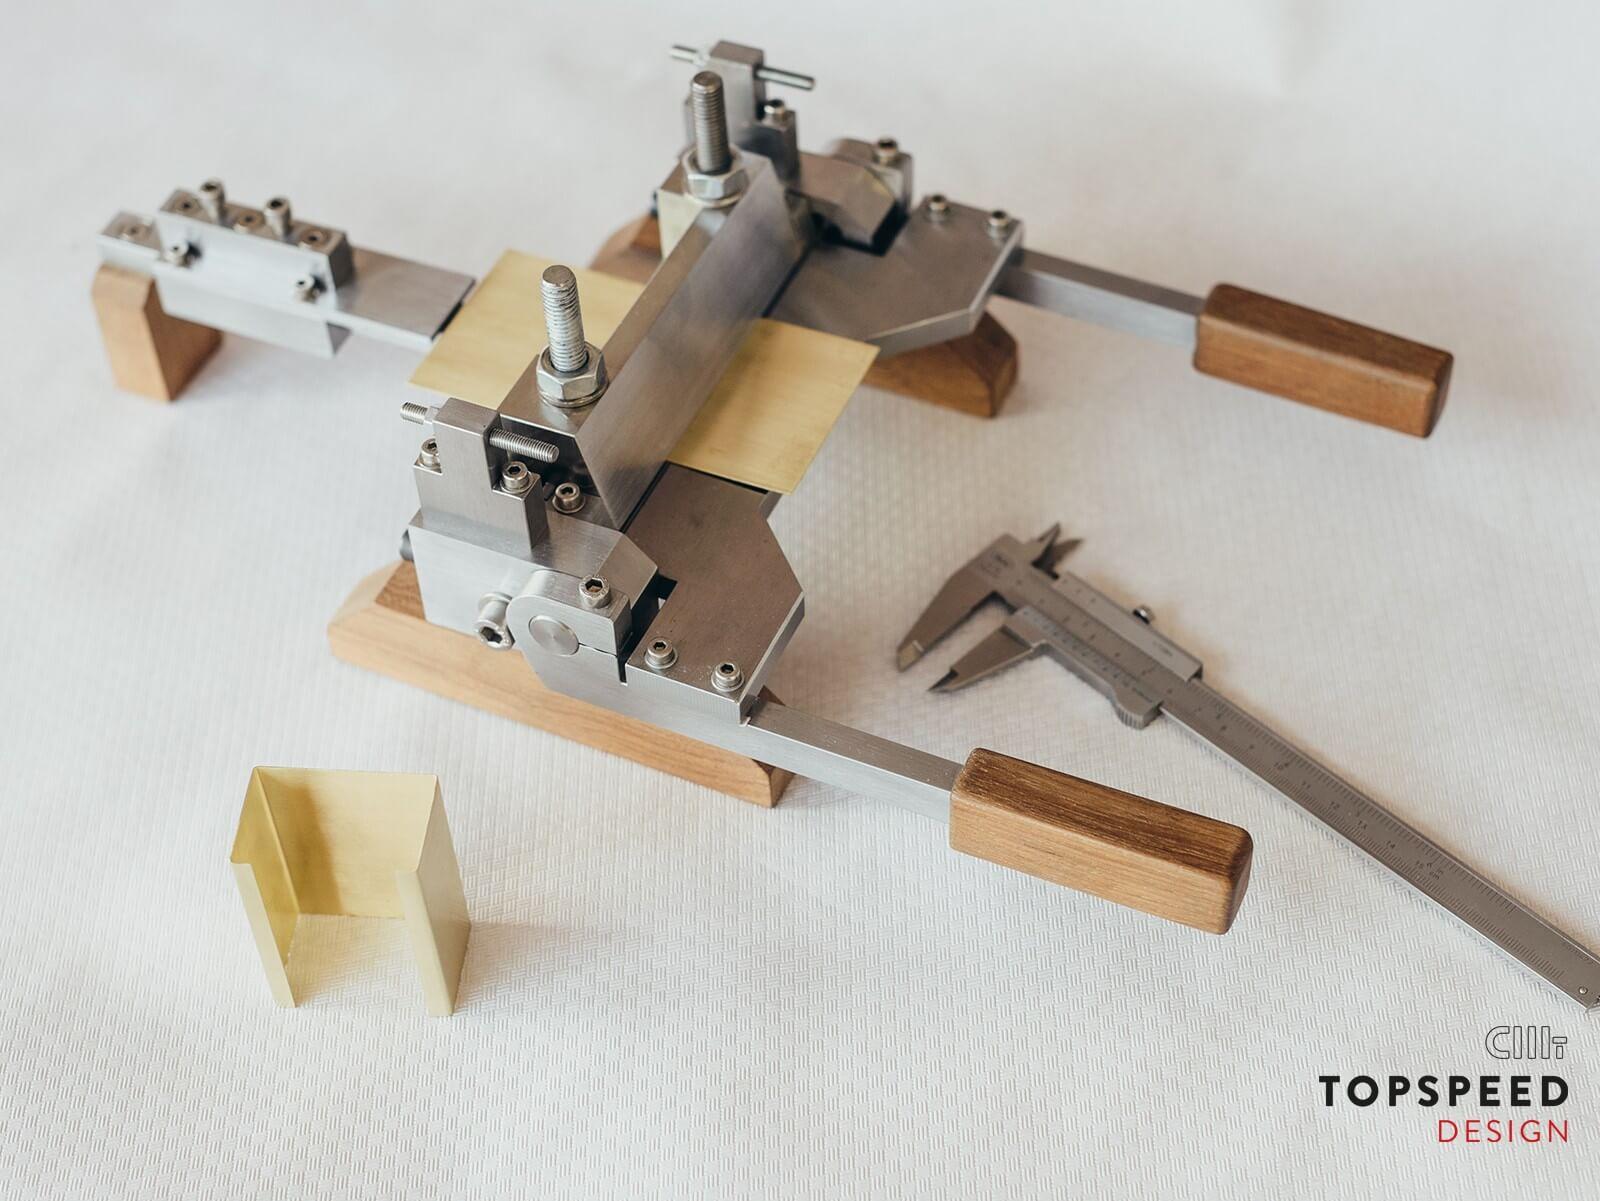 Feinmechanik | Topspeed Design by Bernhard Schmidt